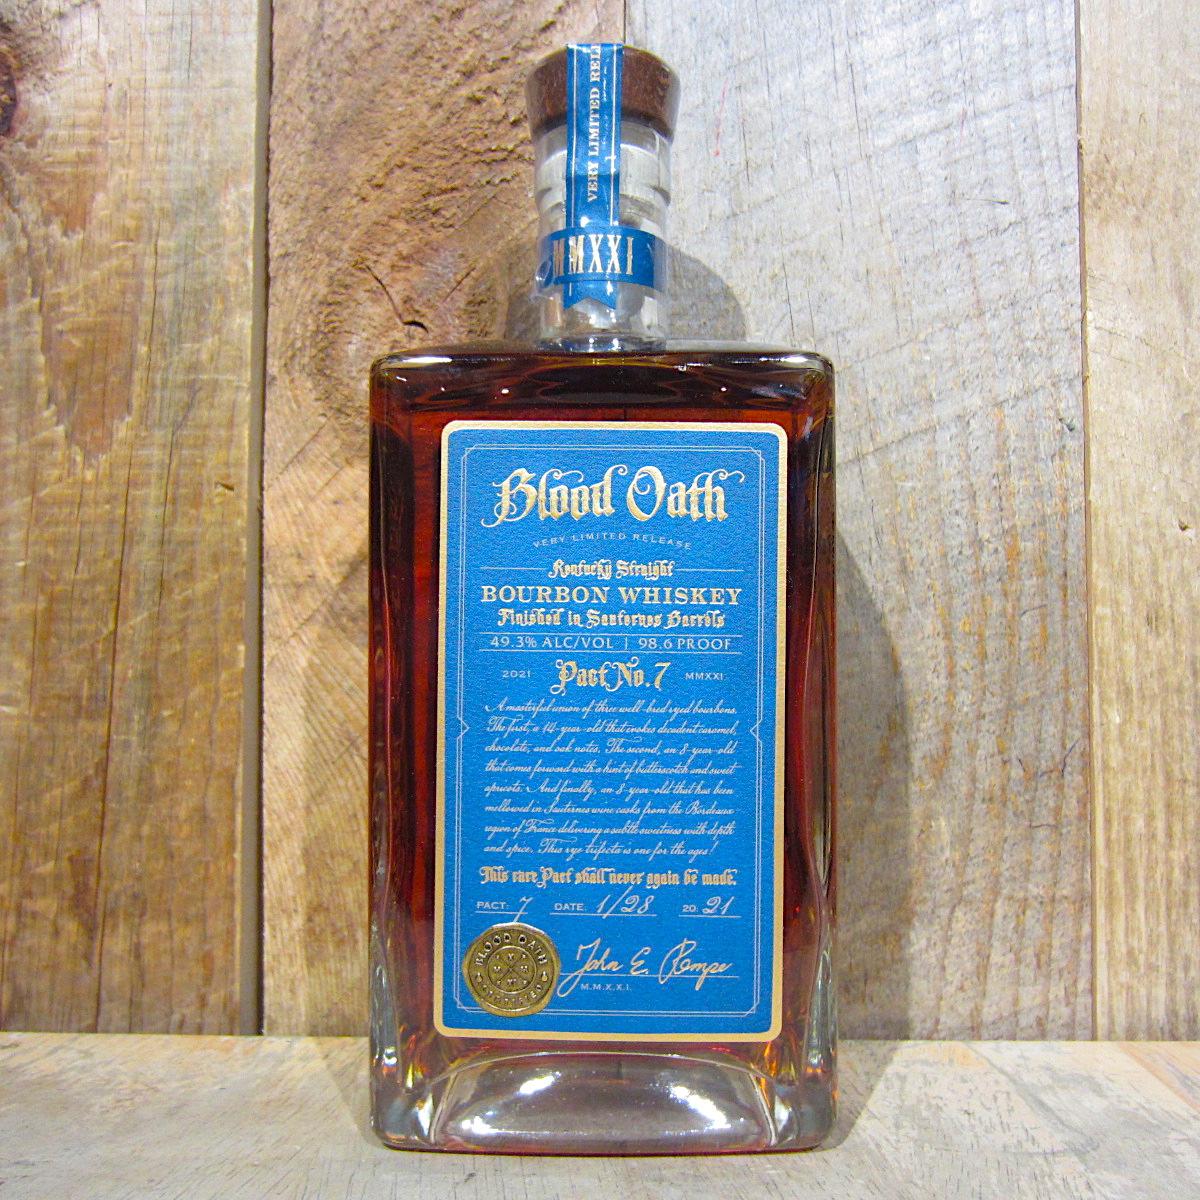 Blood Oath Bourbon Pact No. 7 750ml